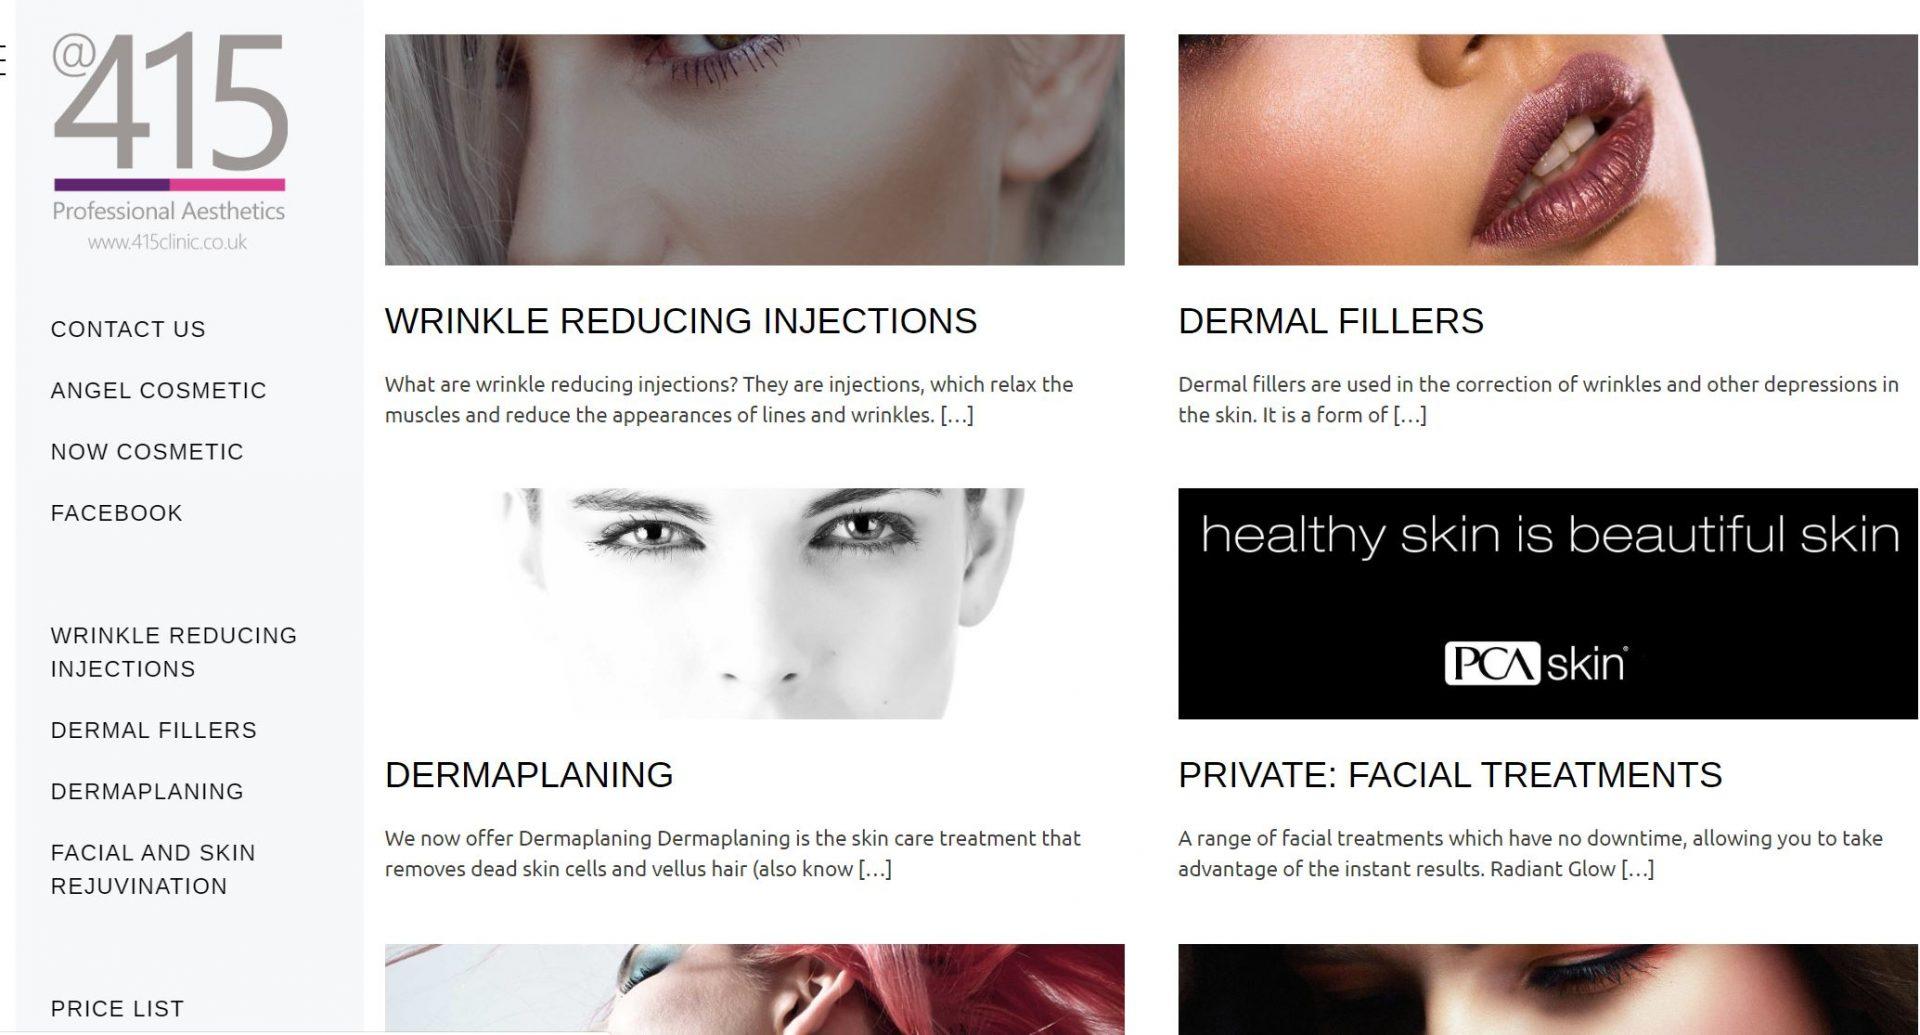 Website for Aesthetics Clinic